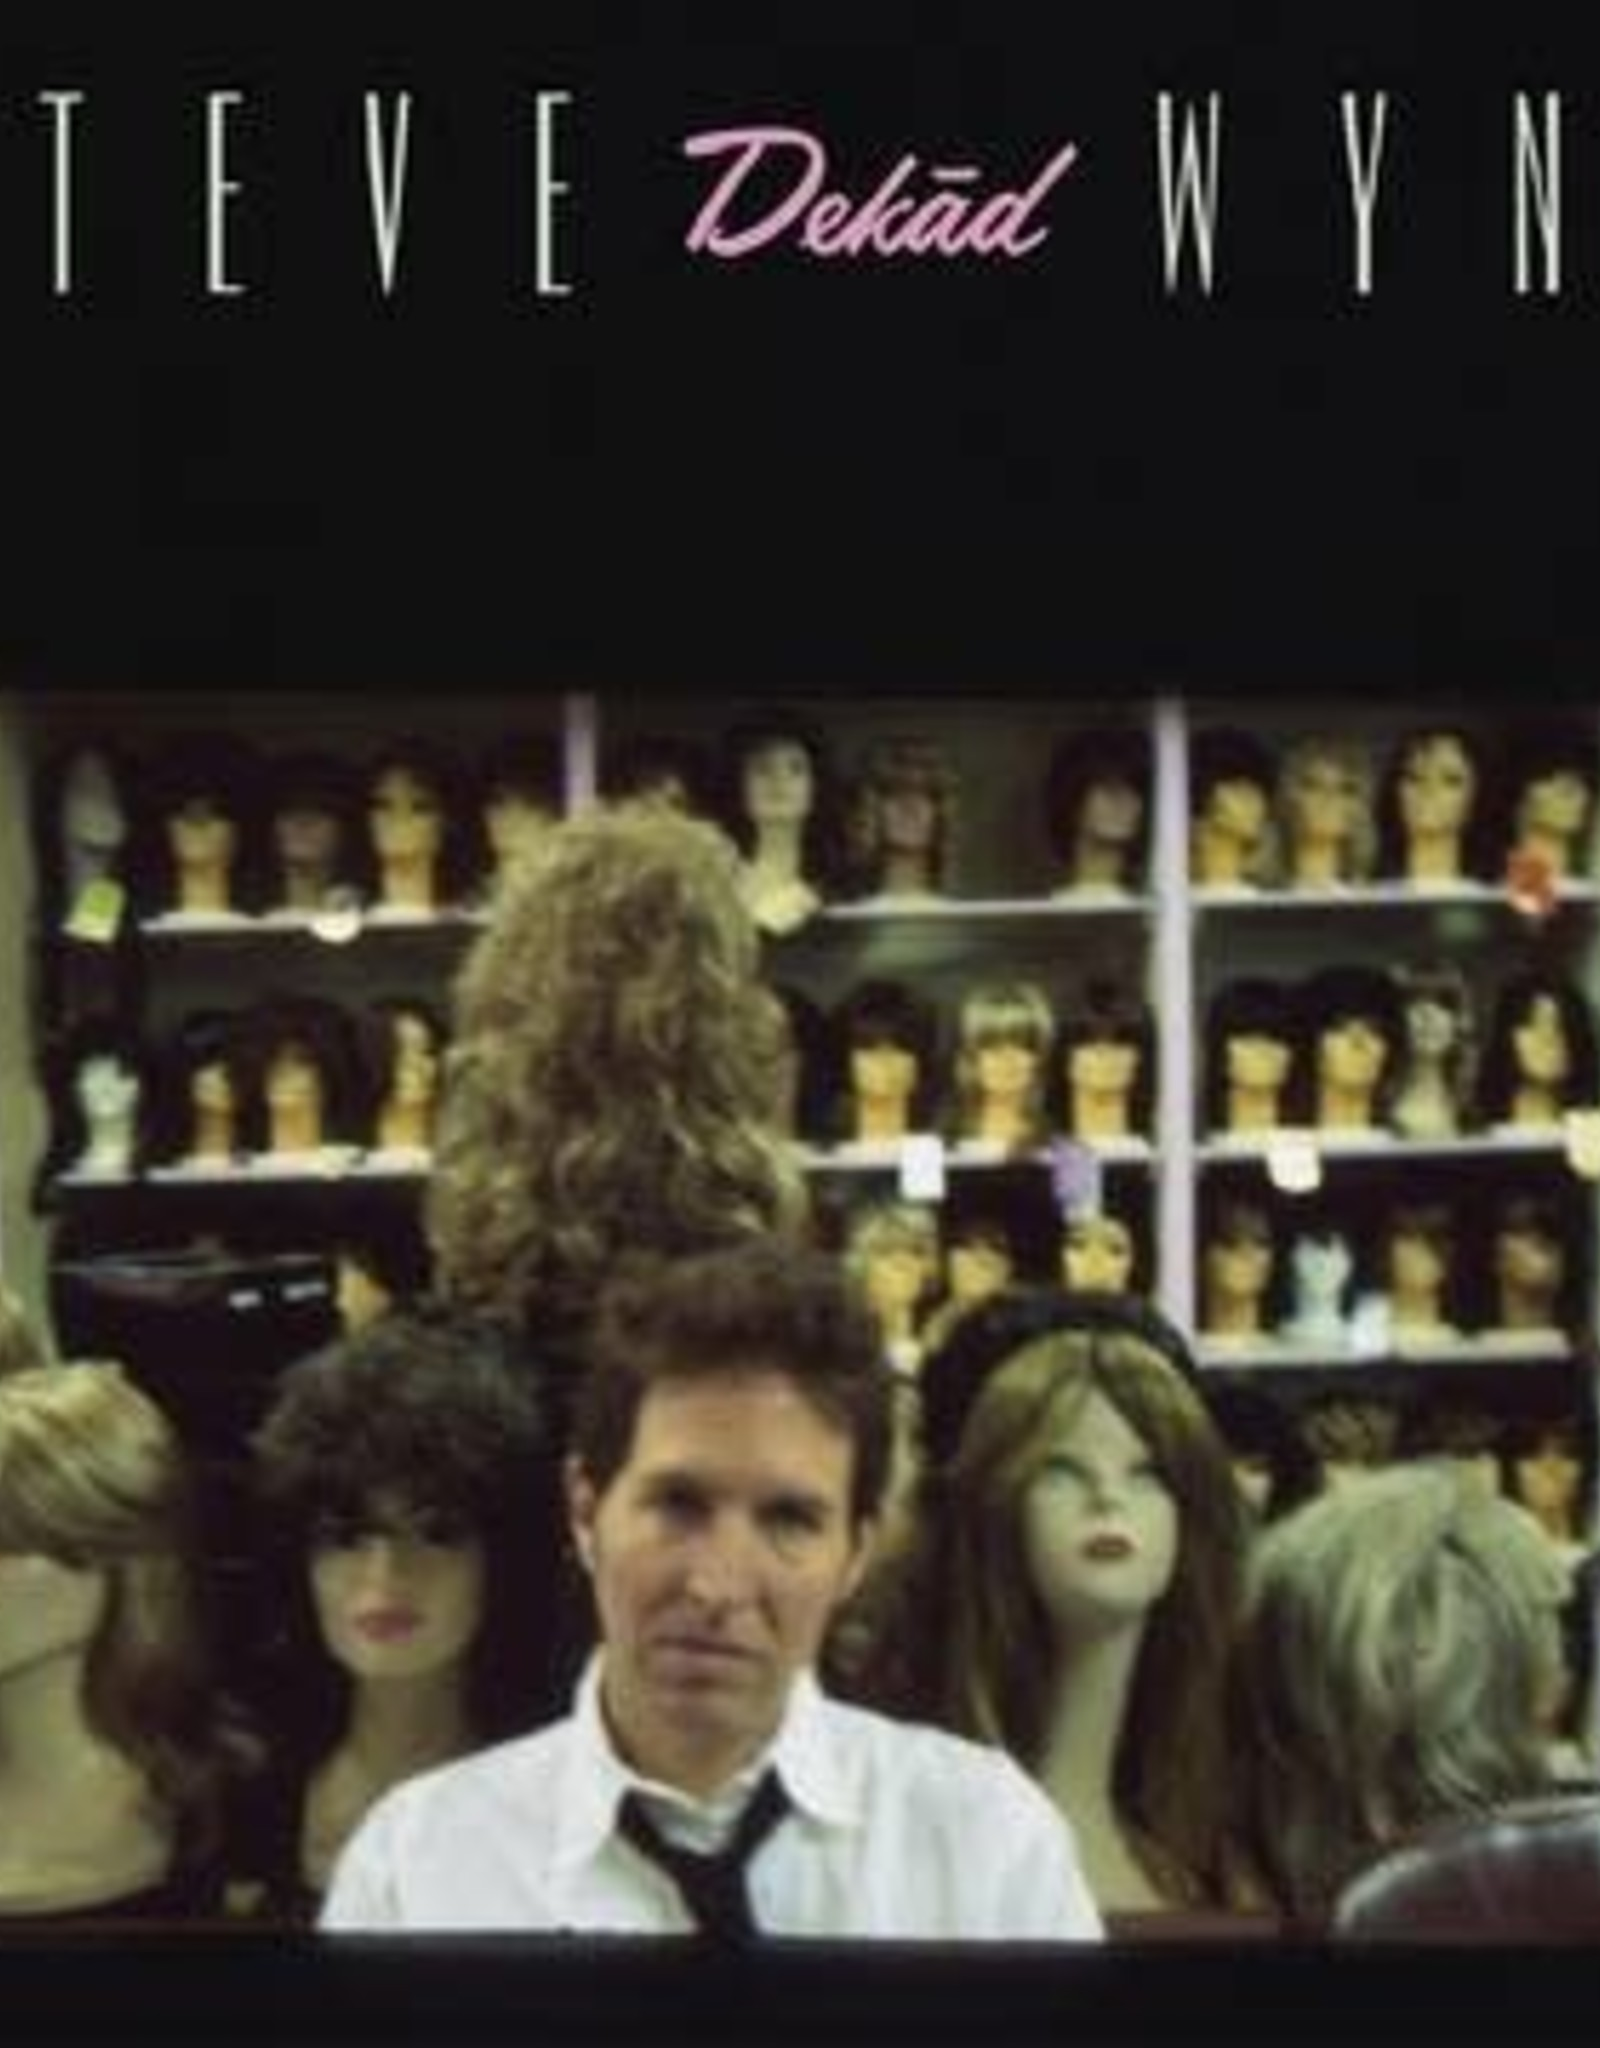 Steve Wynn - Dekād--Rare & Unreleased Recordings 1995-2005 (Clear Pink Vinyl/2Lp) (RSD 6/21)